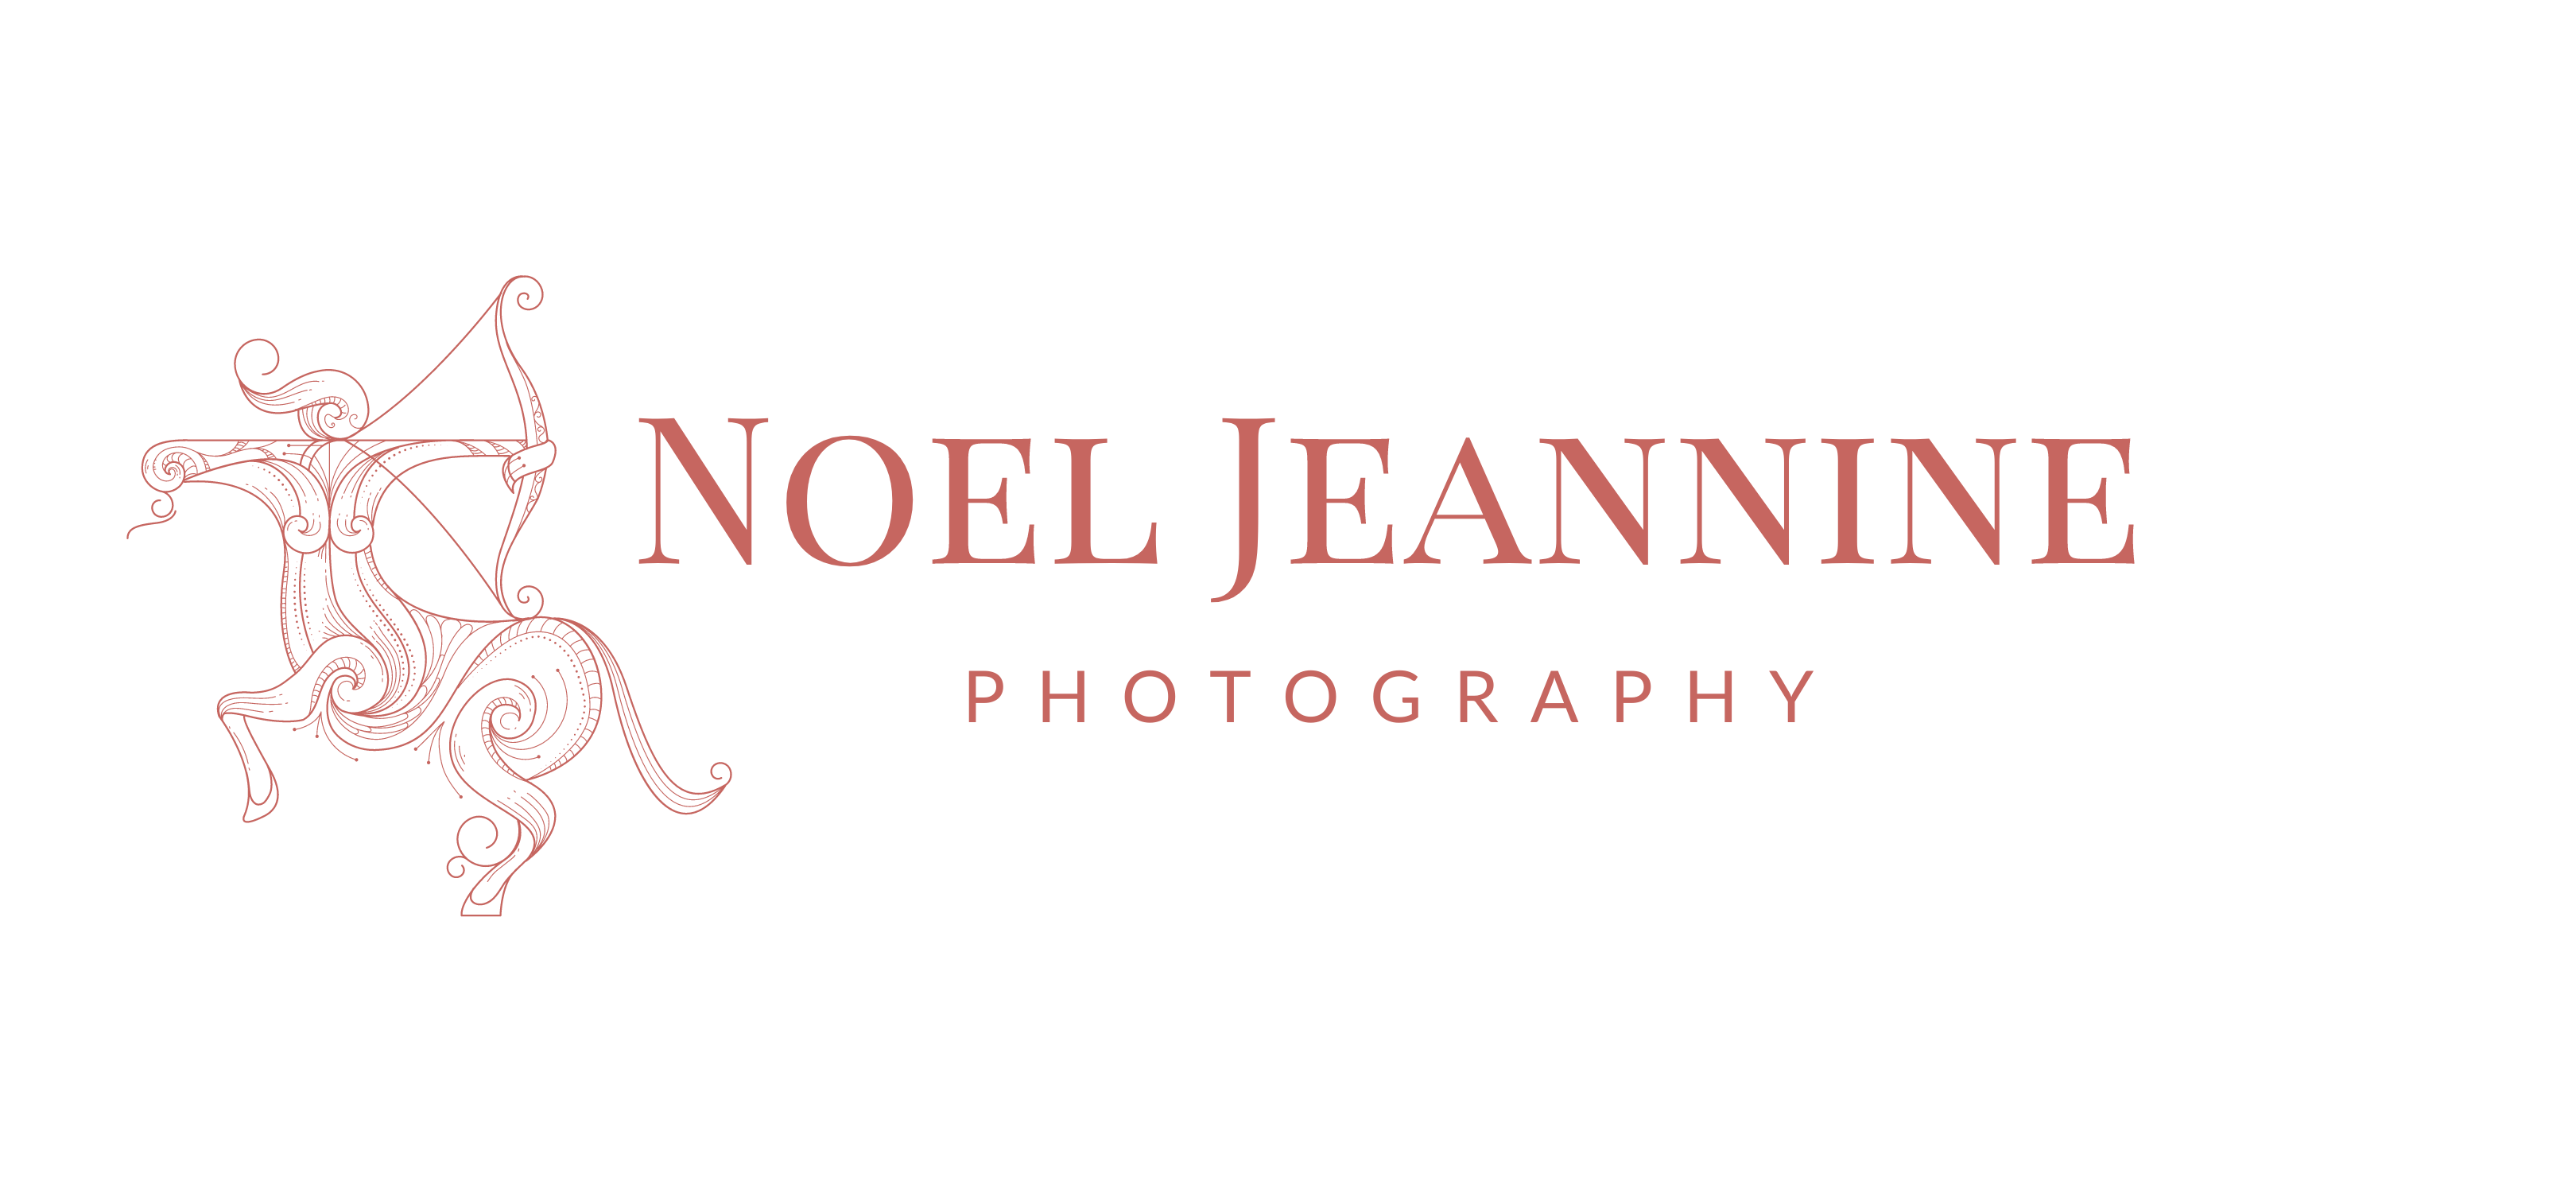 Noel Jeannine Photography